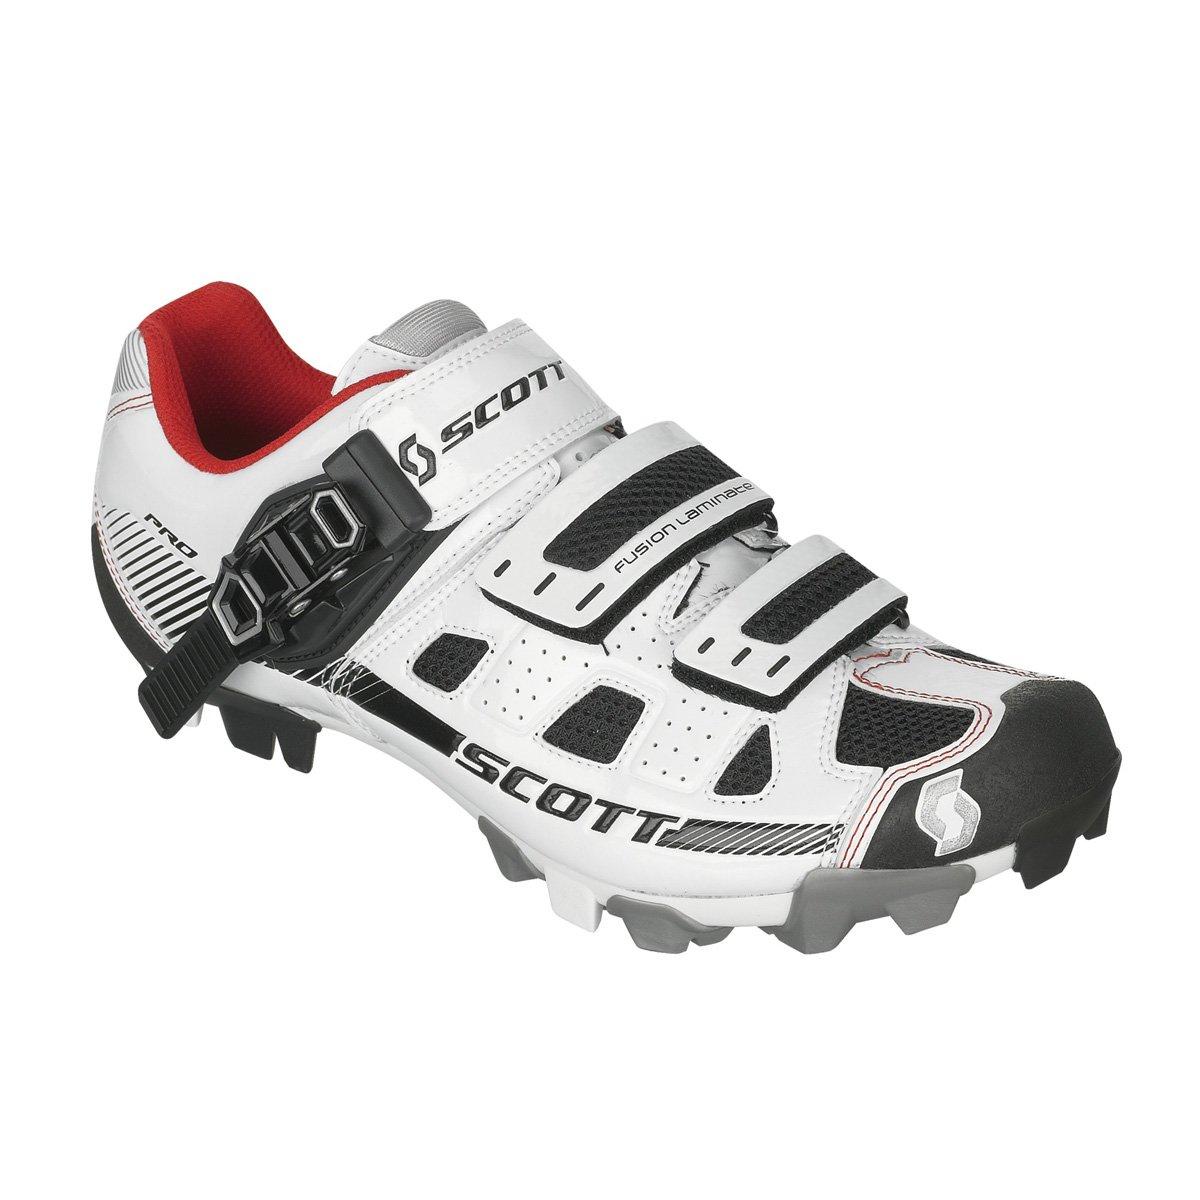 Scott Sports 2016 Women's Pro Mountain Cycling Shoe - 234716-2979 (white gloss - 37.0)